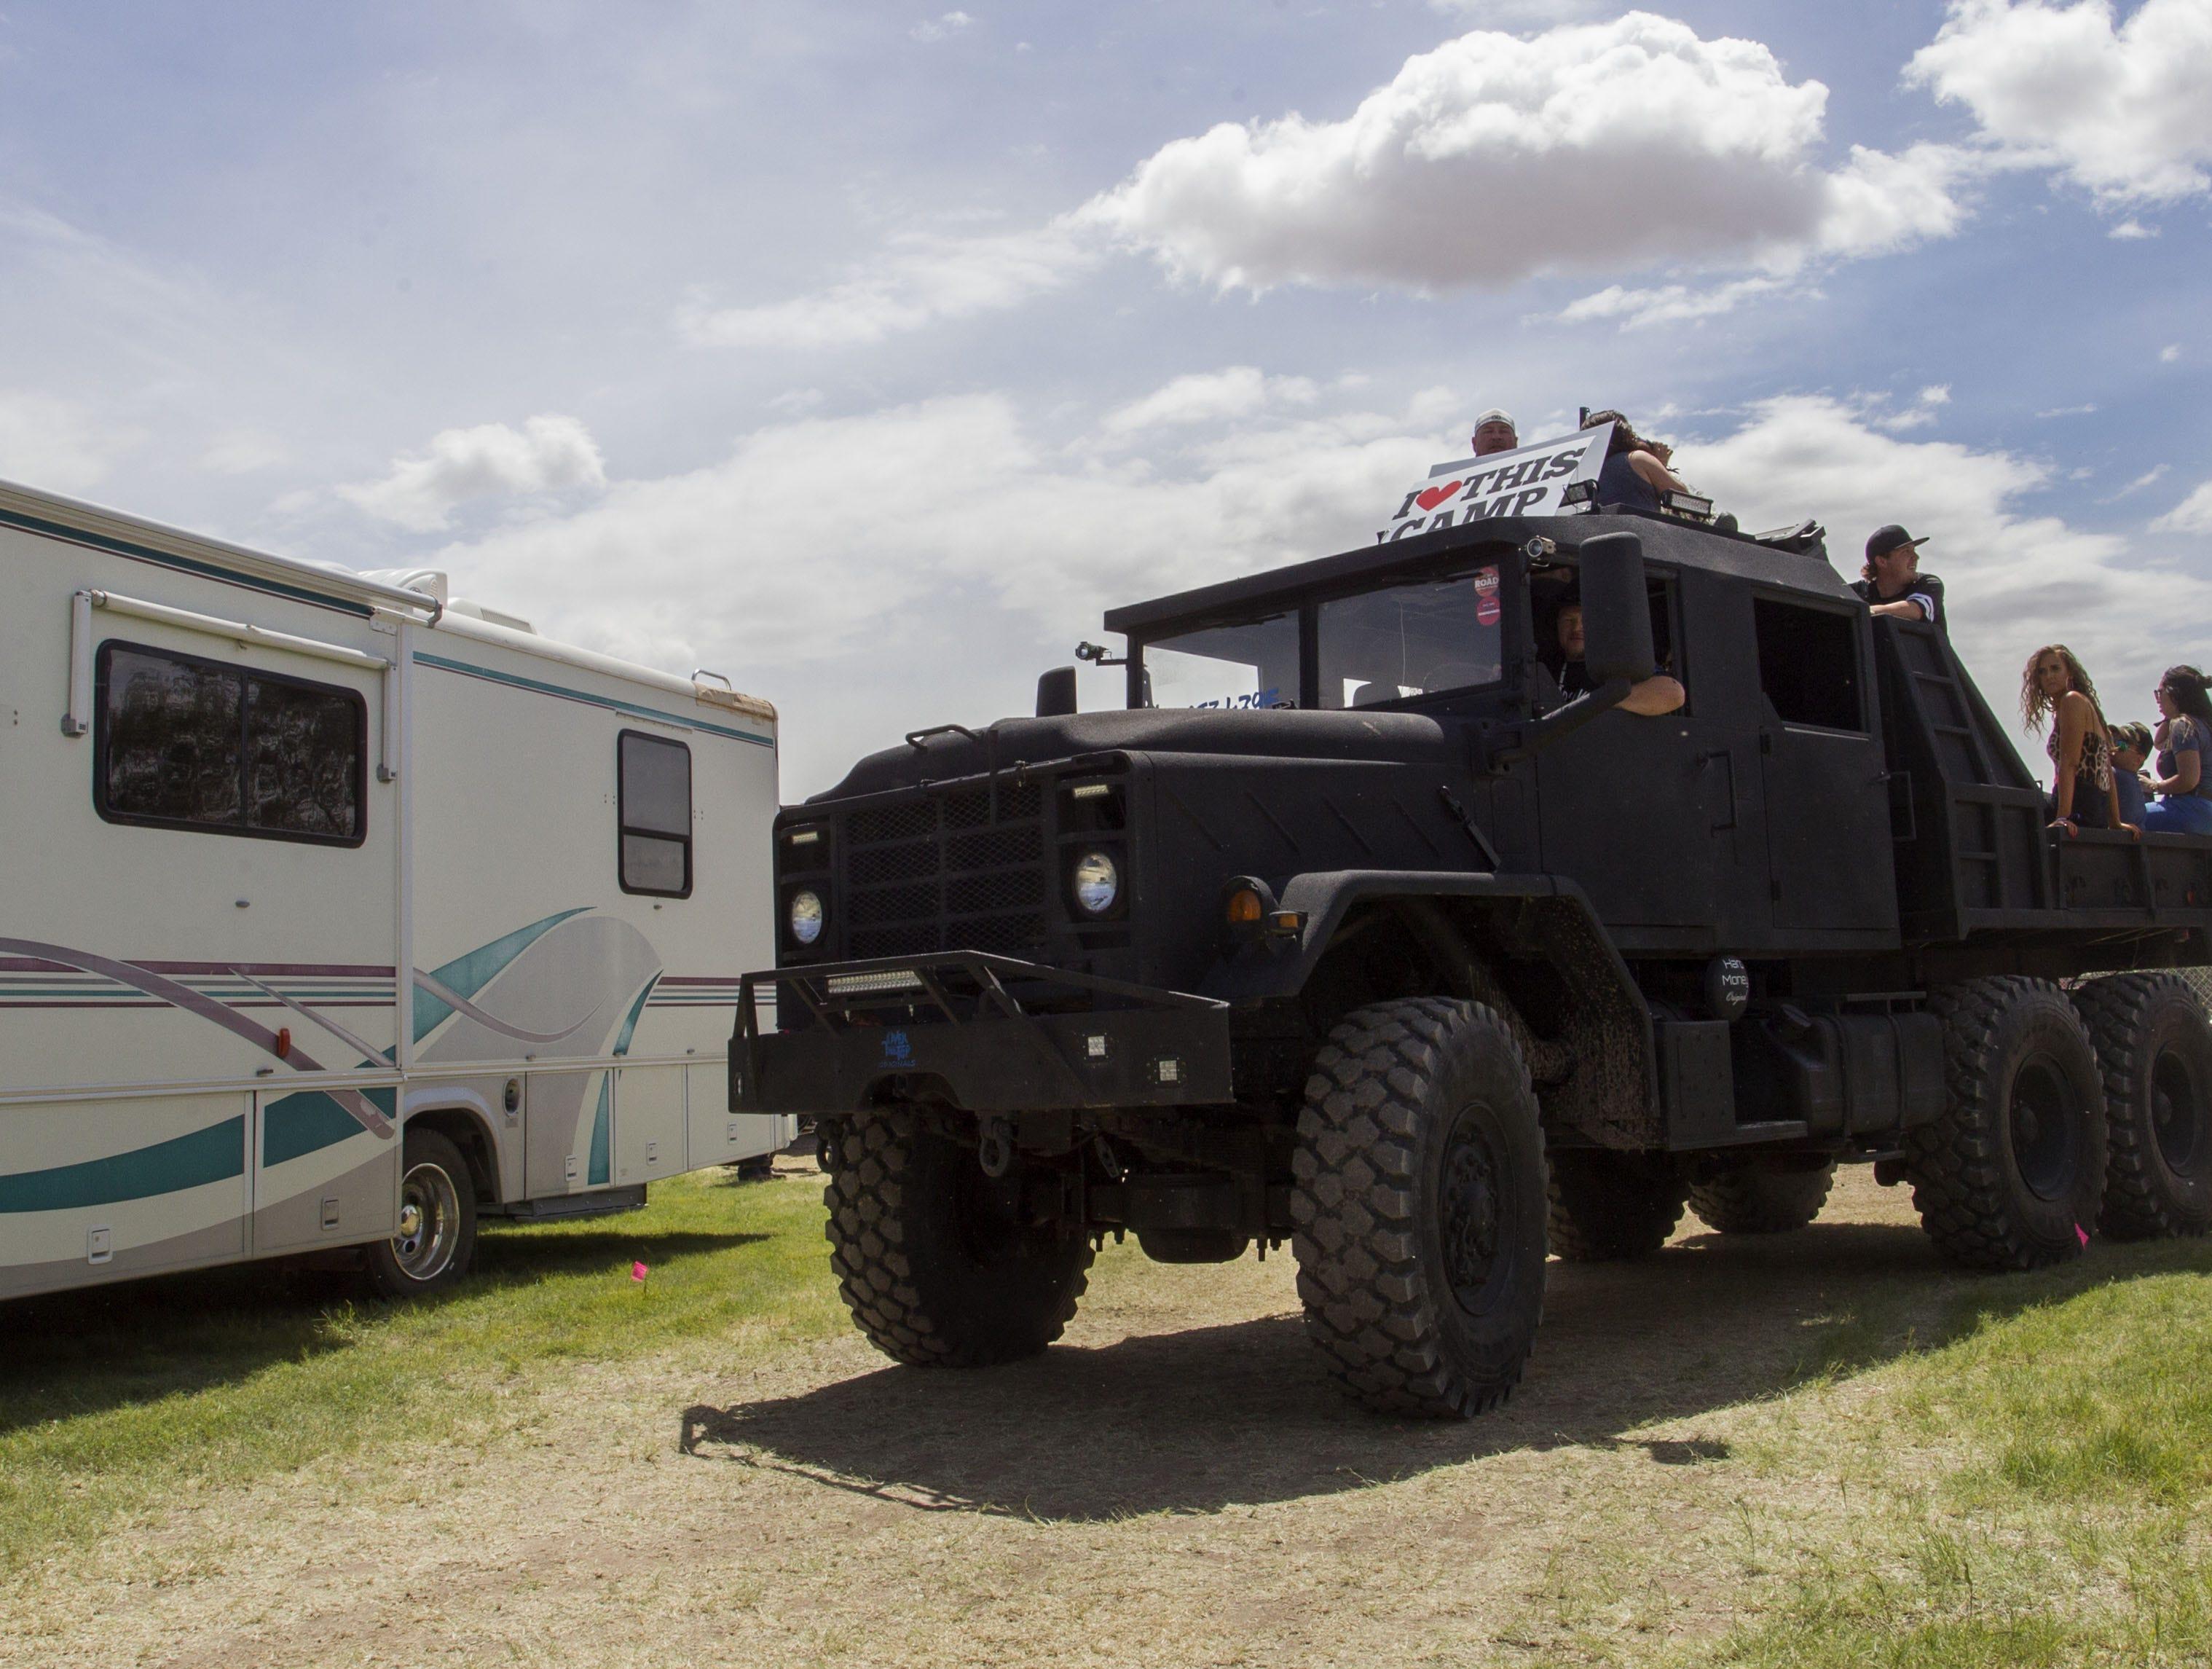 I Love this Camp's big truck hauls concert-goers around Country Thunder Arizona Friday, April 12, 2019, in Florence, Arizona.